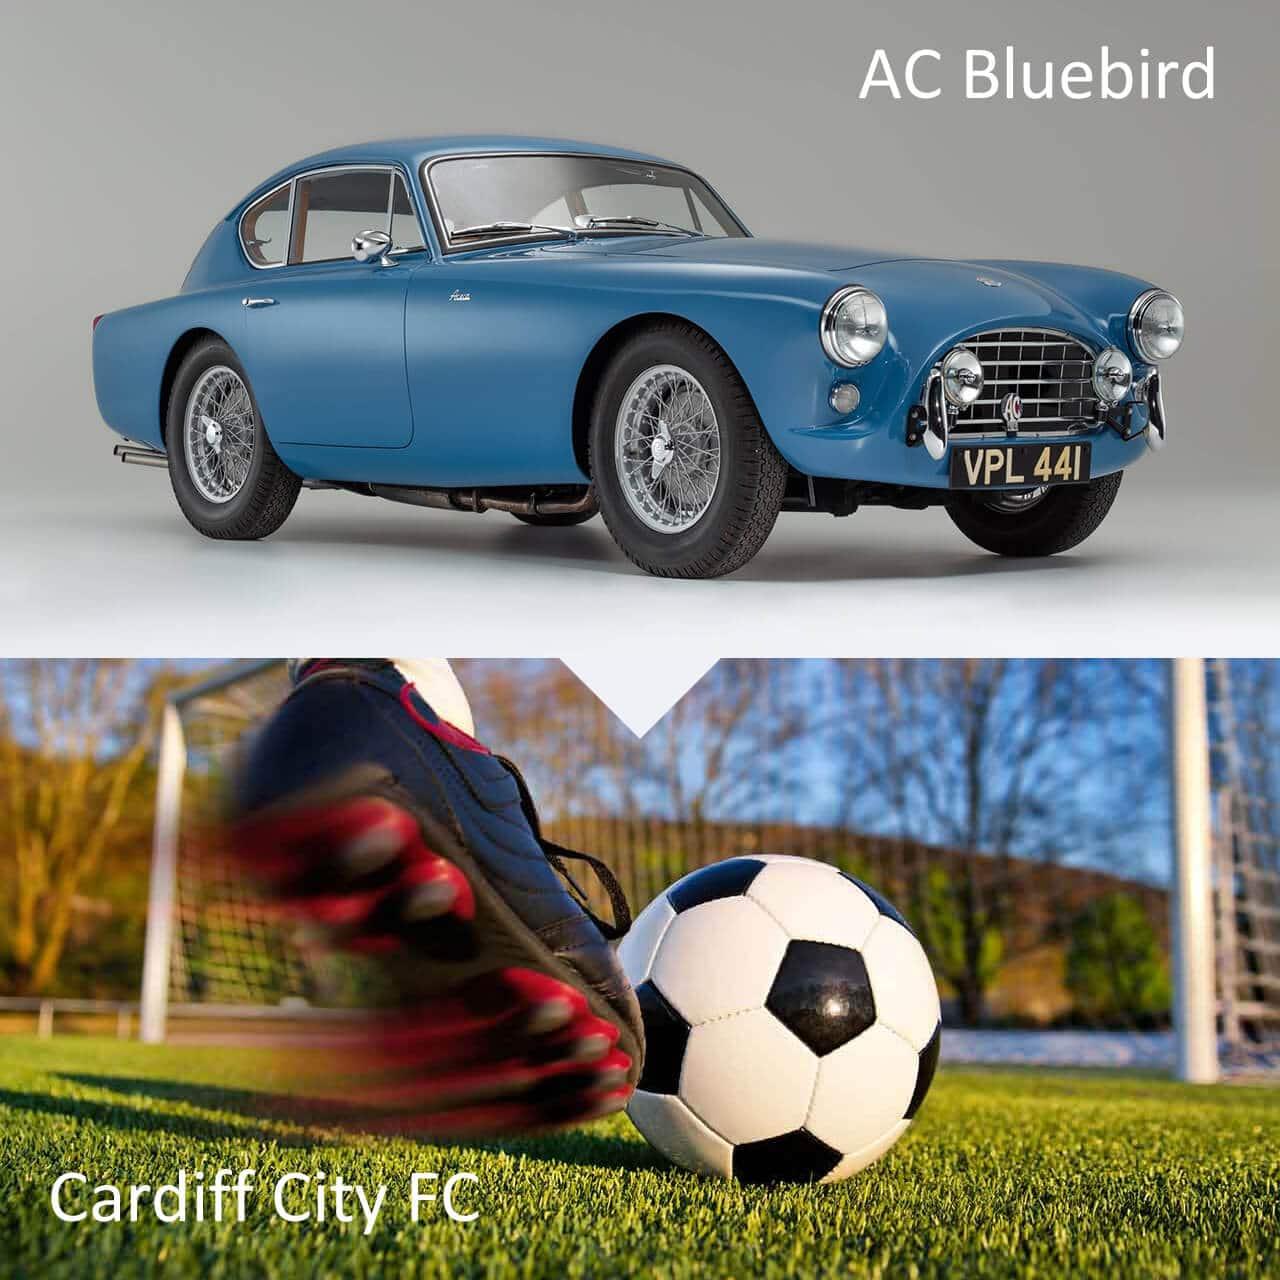 AC Bluebird v Cardiff City FC